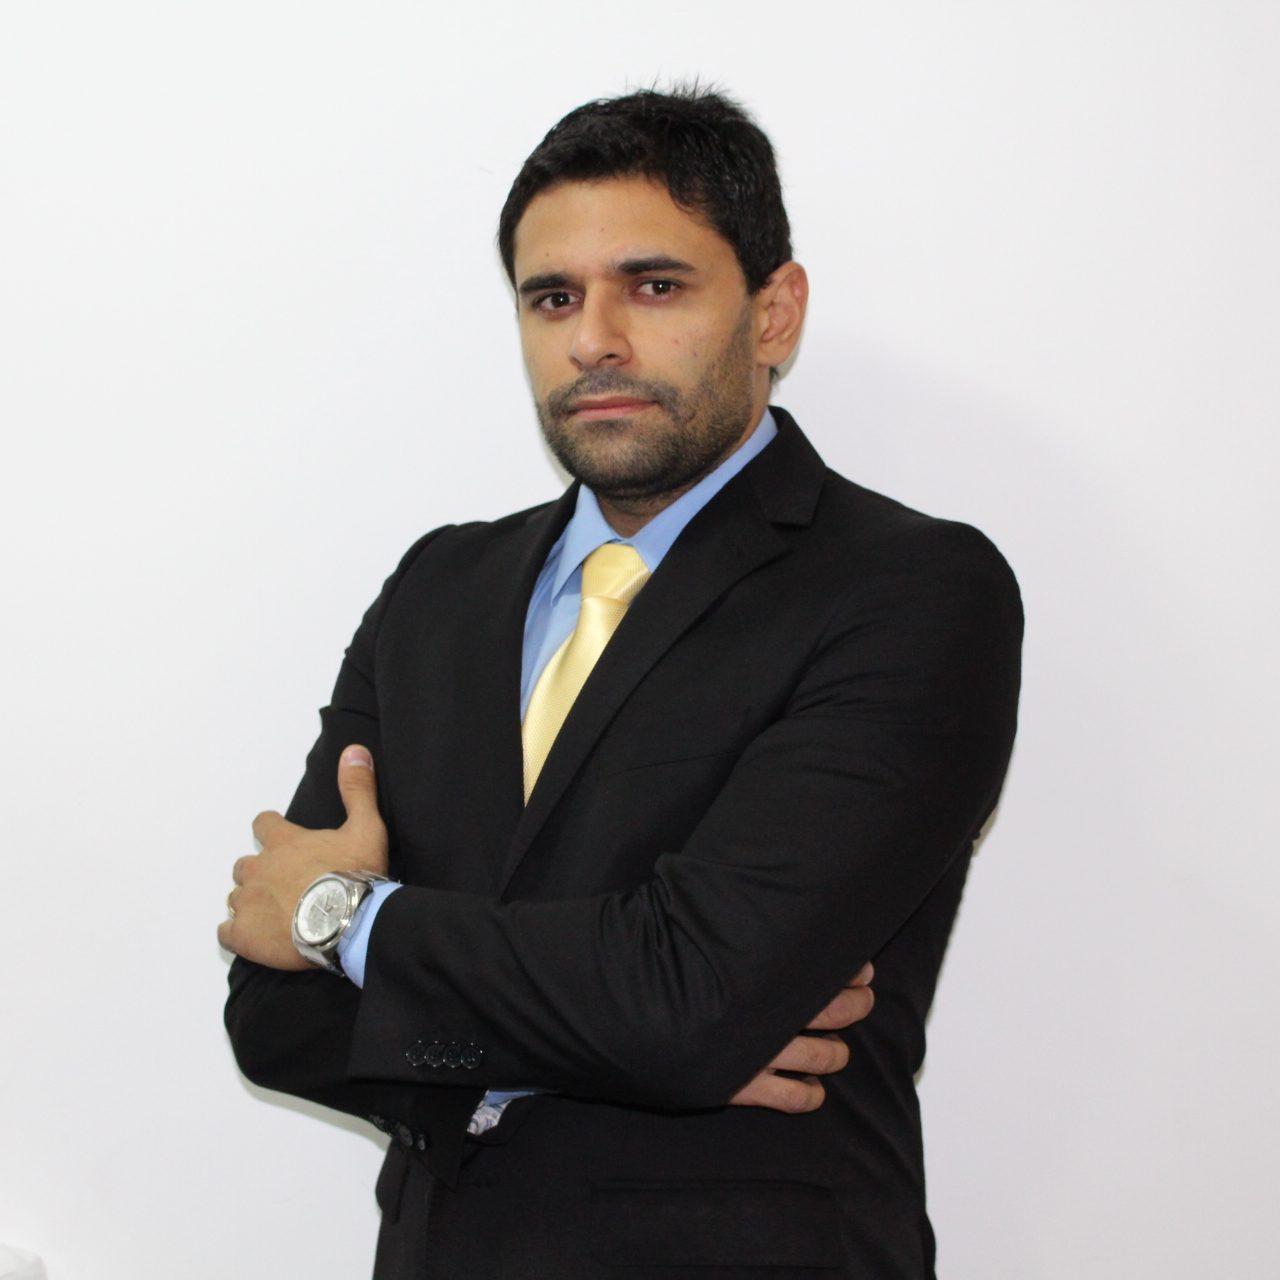 Diego Henrique